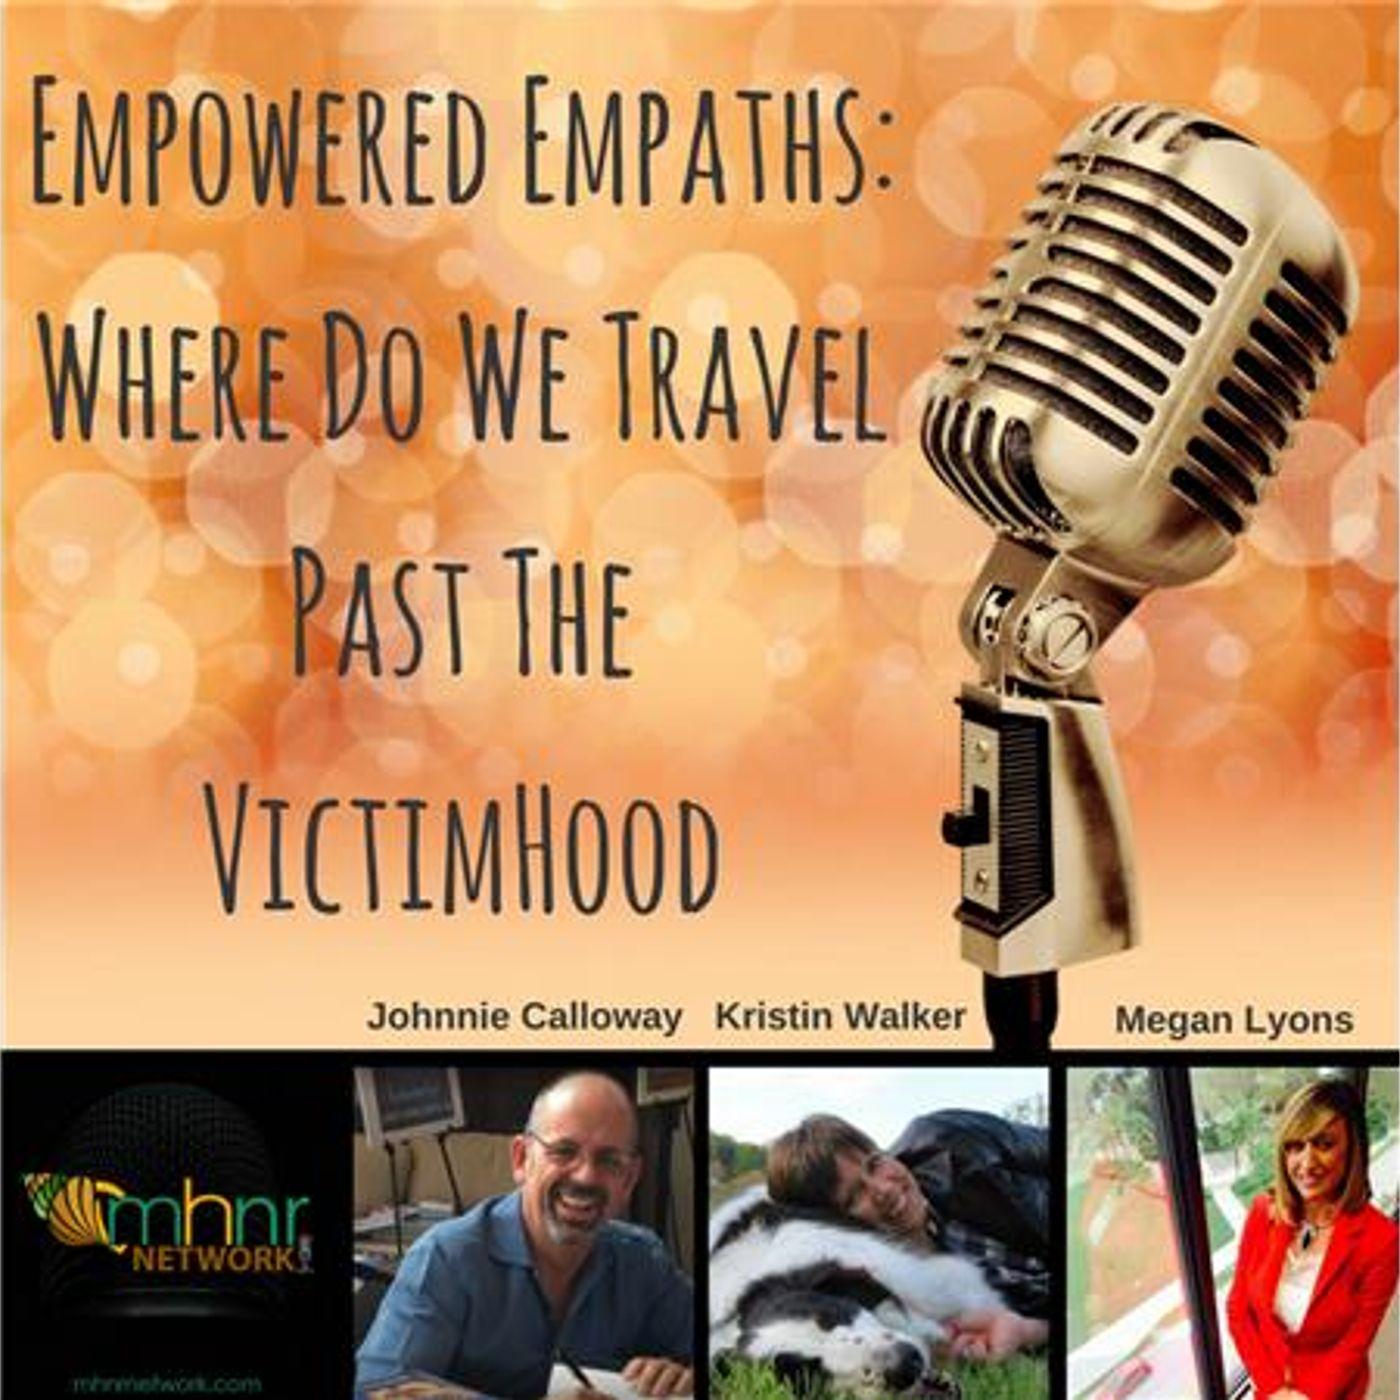 Mental Health News Radio - Empowered Empaths: Where Do We Travel Past The VictimHood?